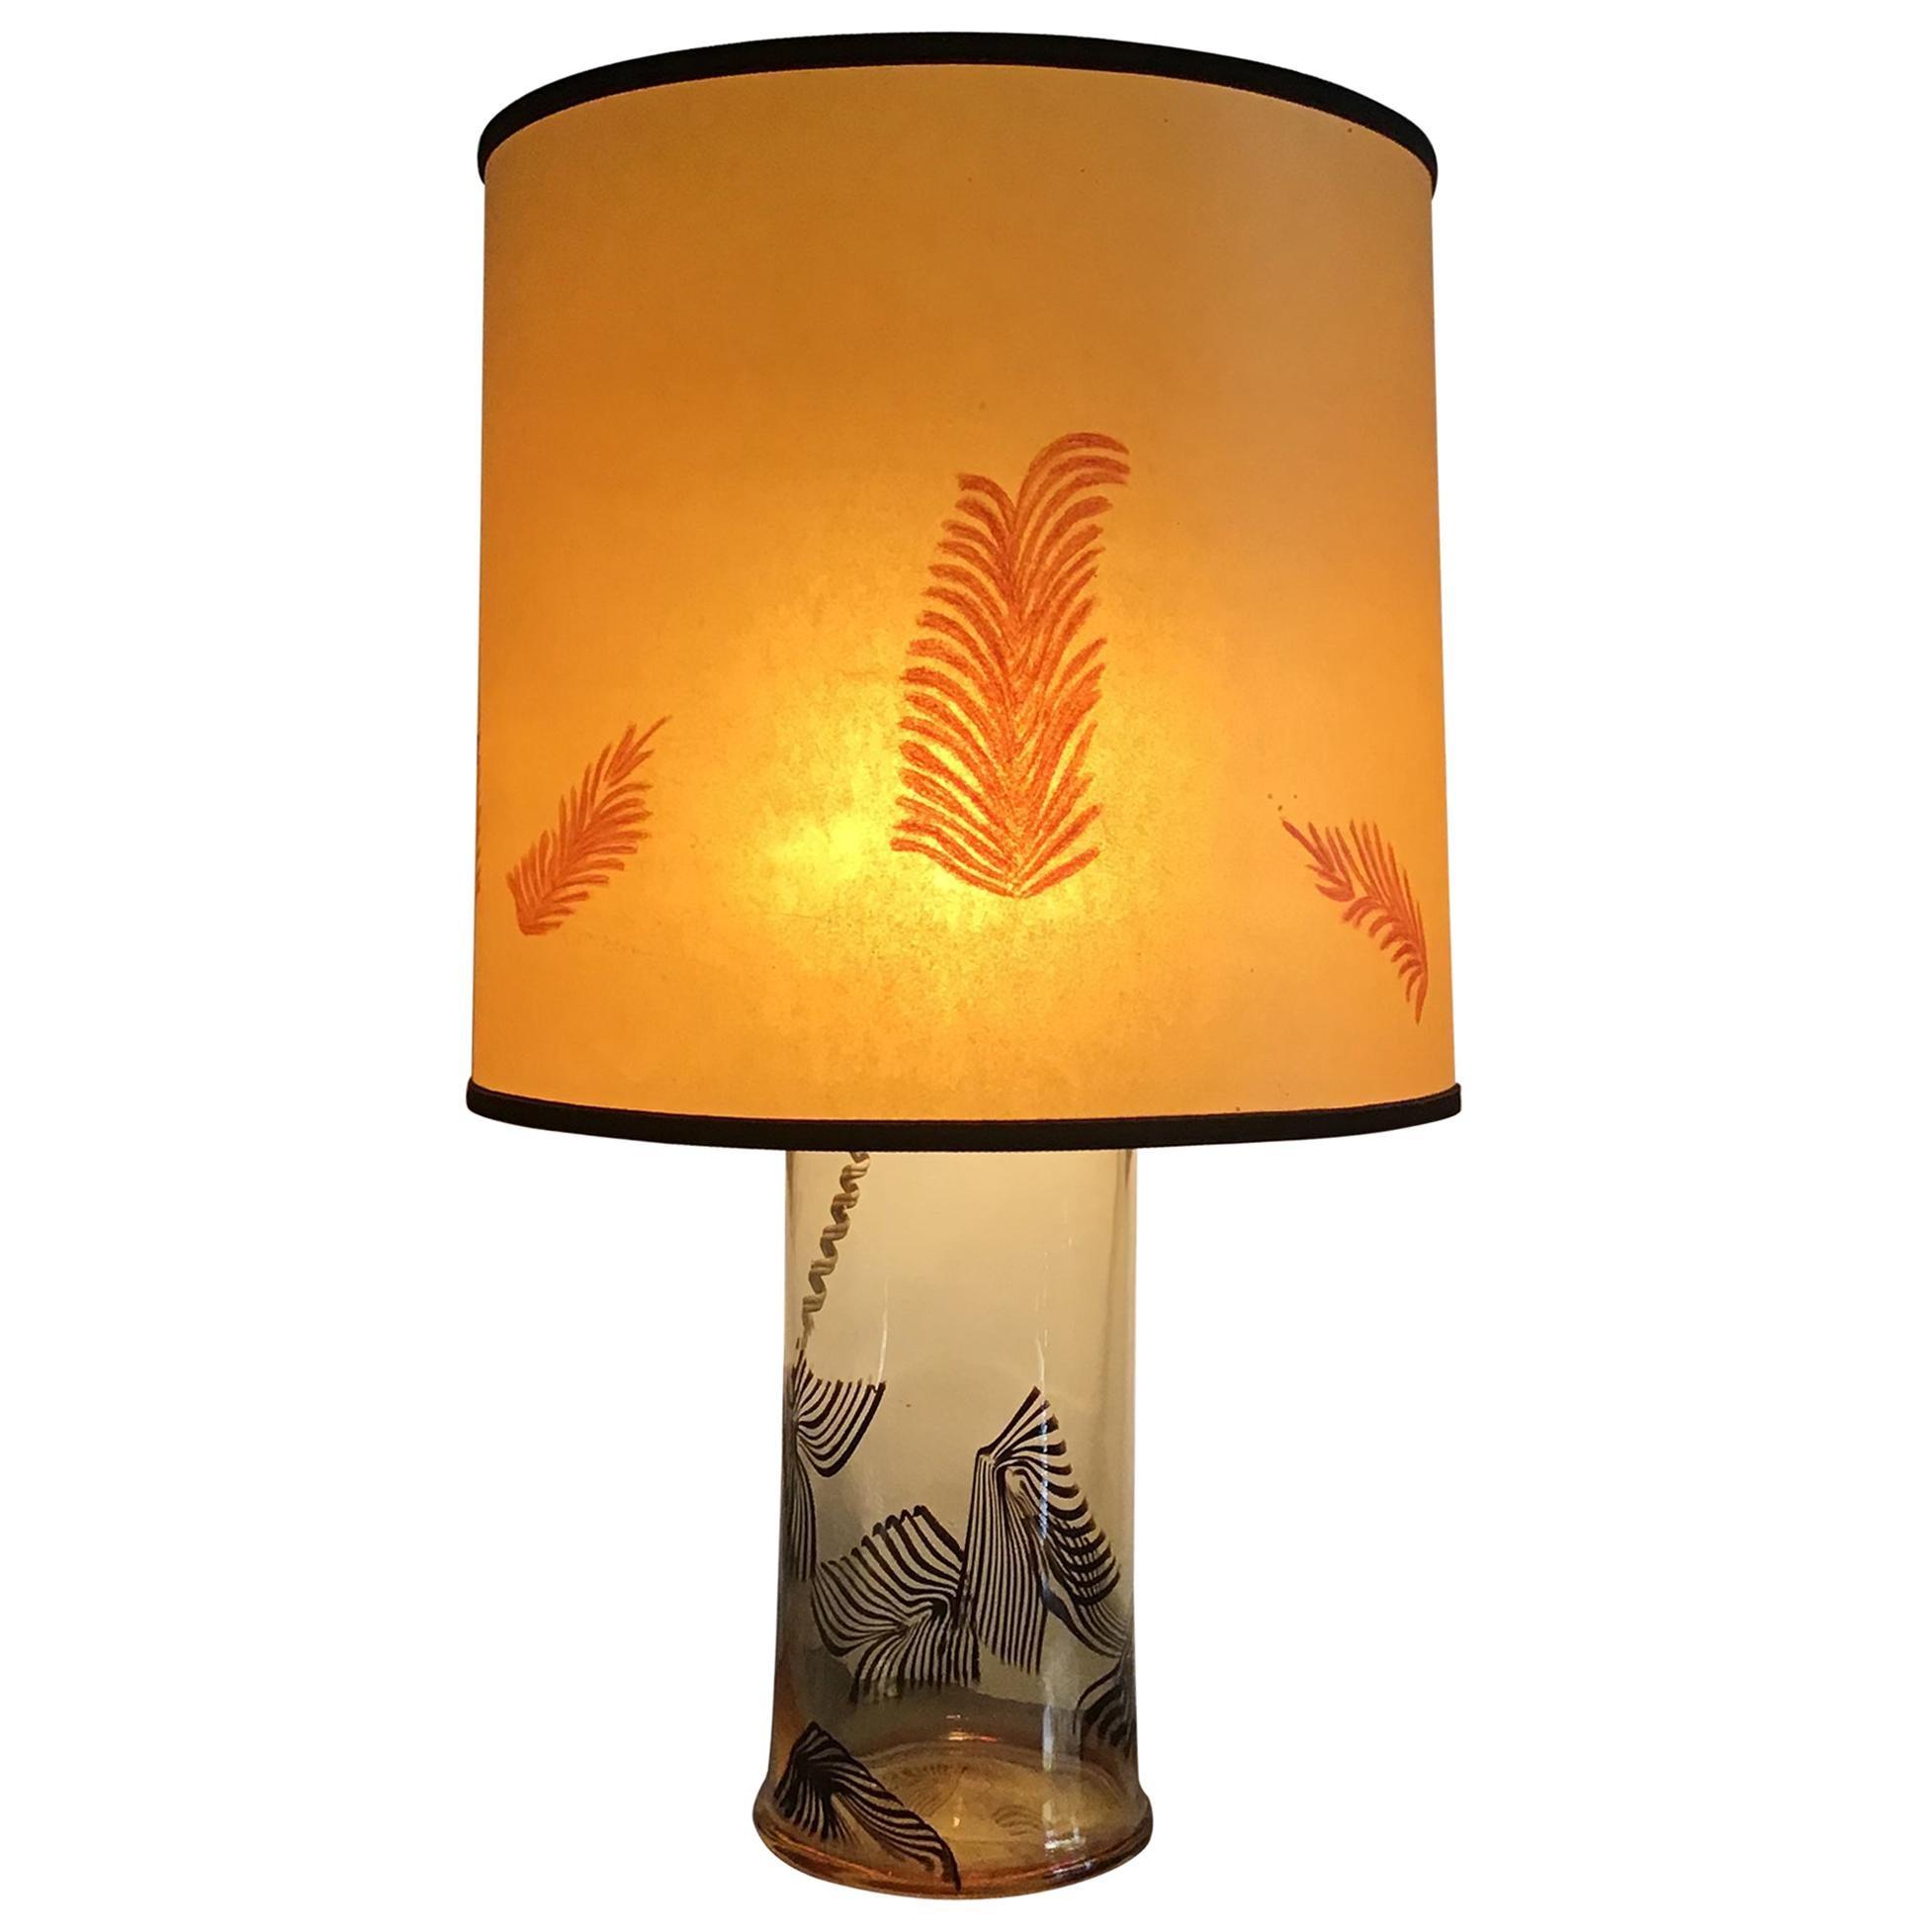 "La Murrina ""Lino Tagliapietra"" Table Lamp 1972 Murano Glass Brass, Italy"